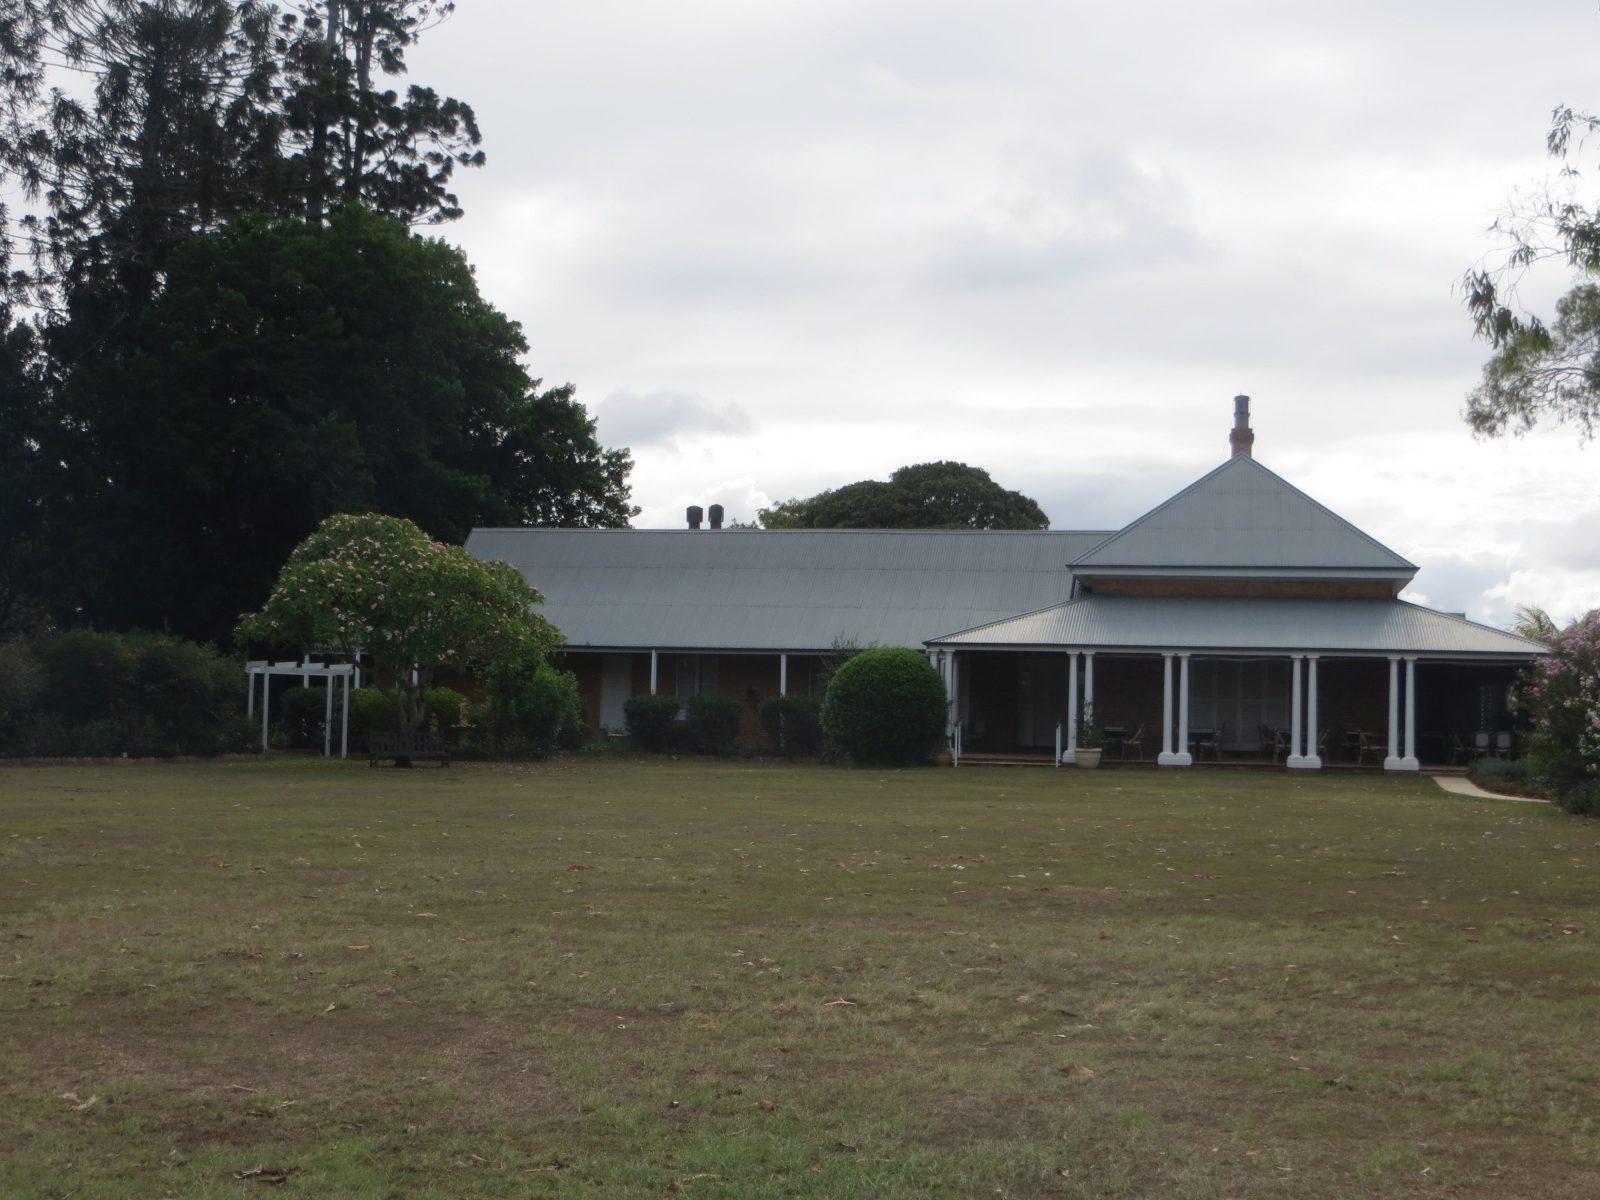 View of Historic Ormiston House